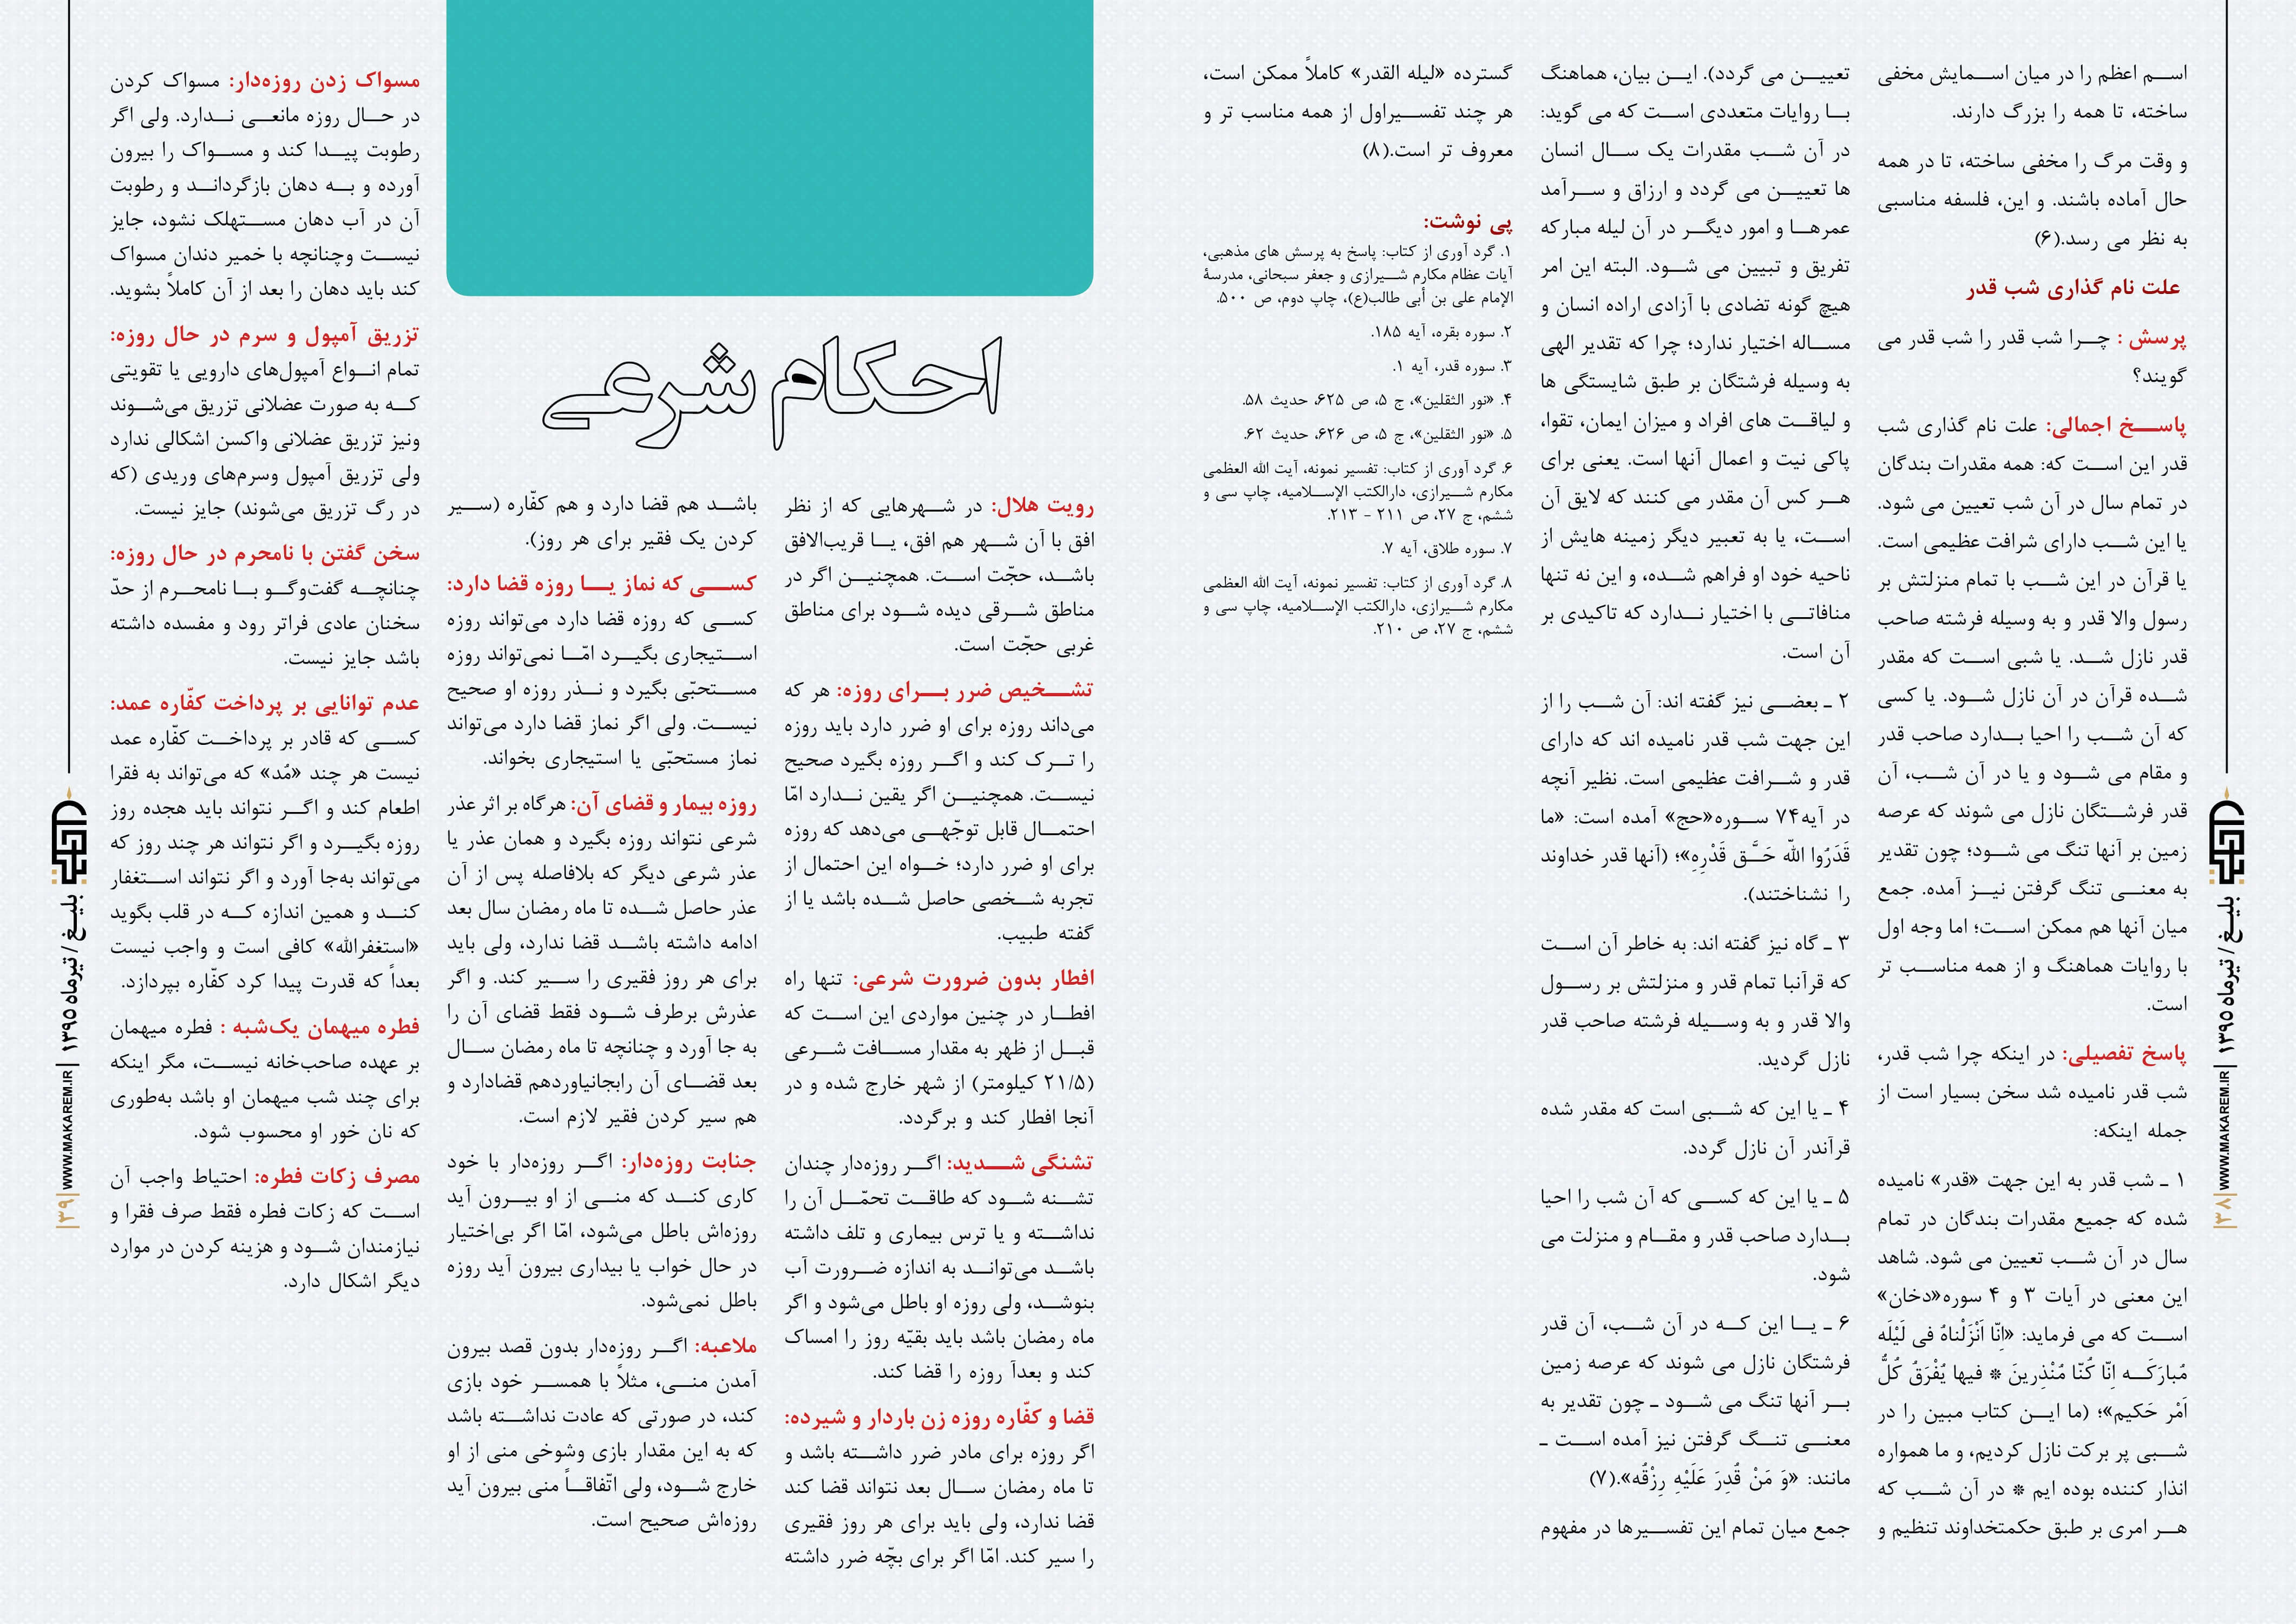 بلیغ 20-مدرسه الامام امیر المومنین (ع)